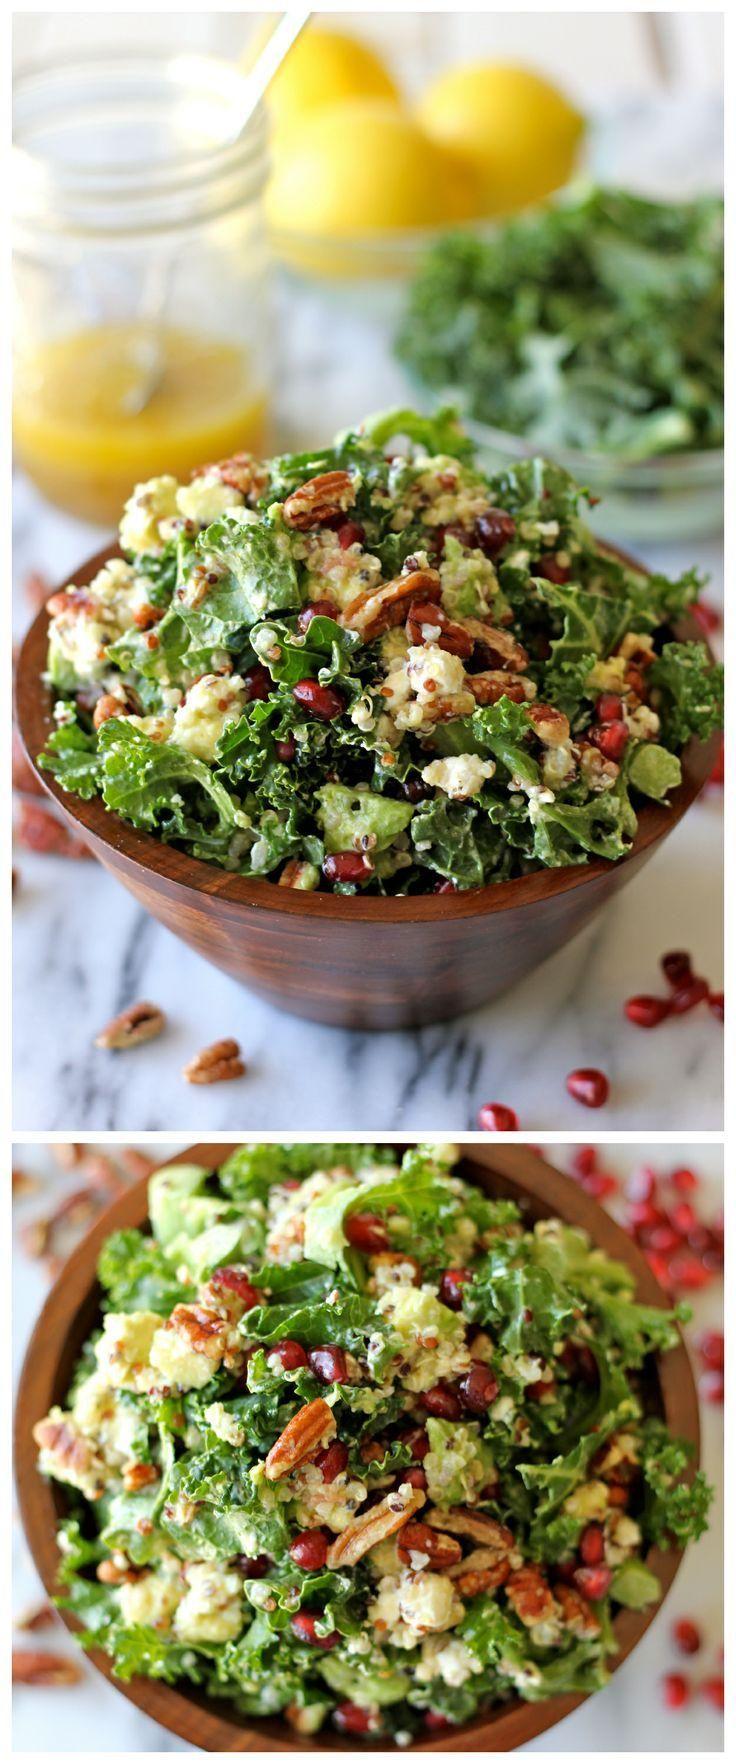 Kale Salad with Meyer Lemon Vinaigrette #clean #healthy #fresh